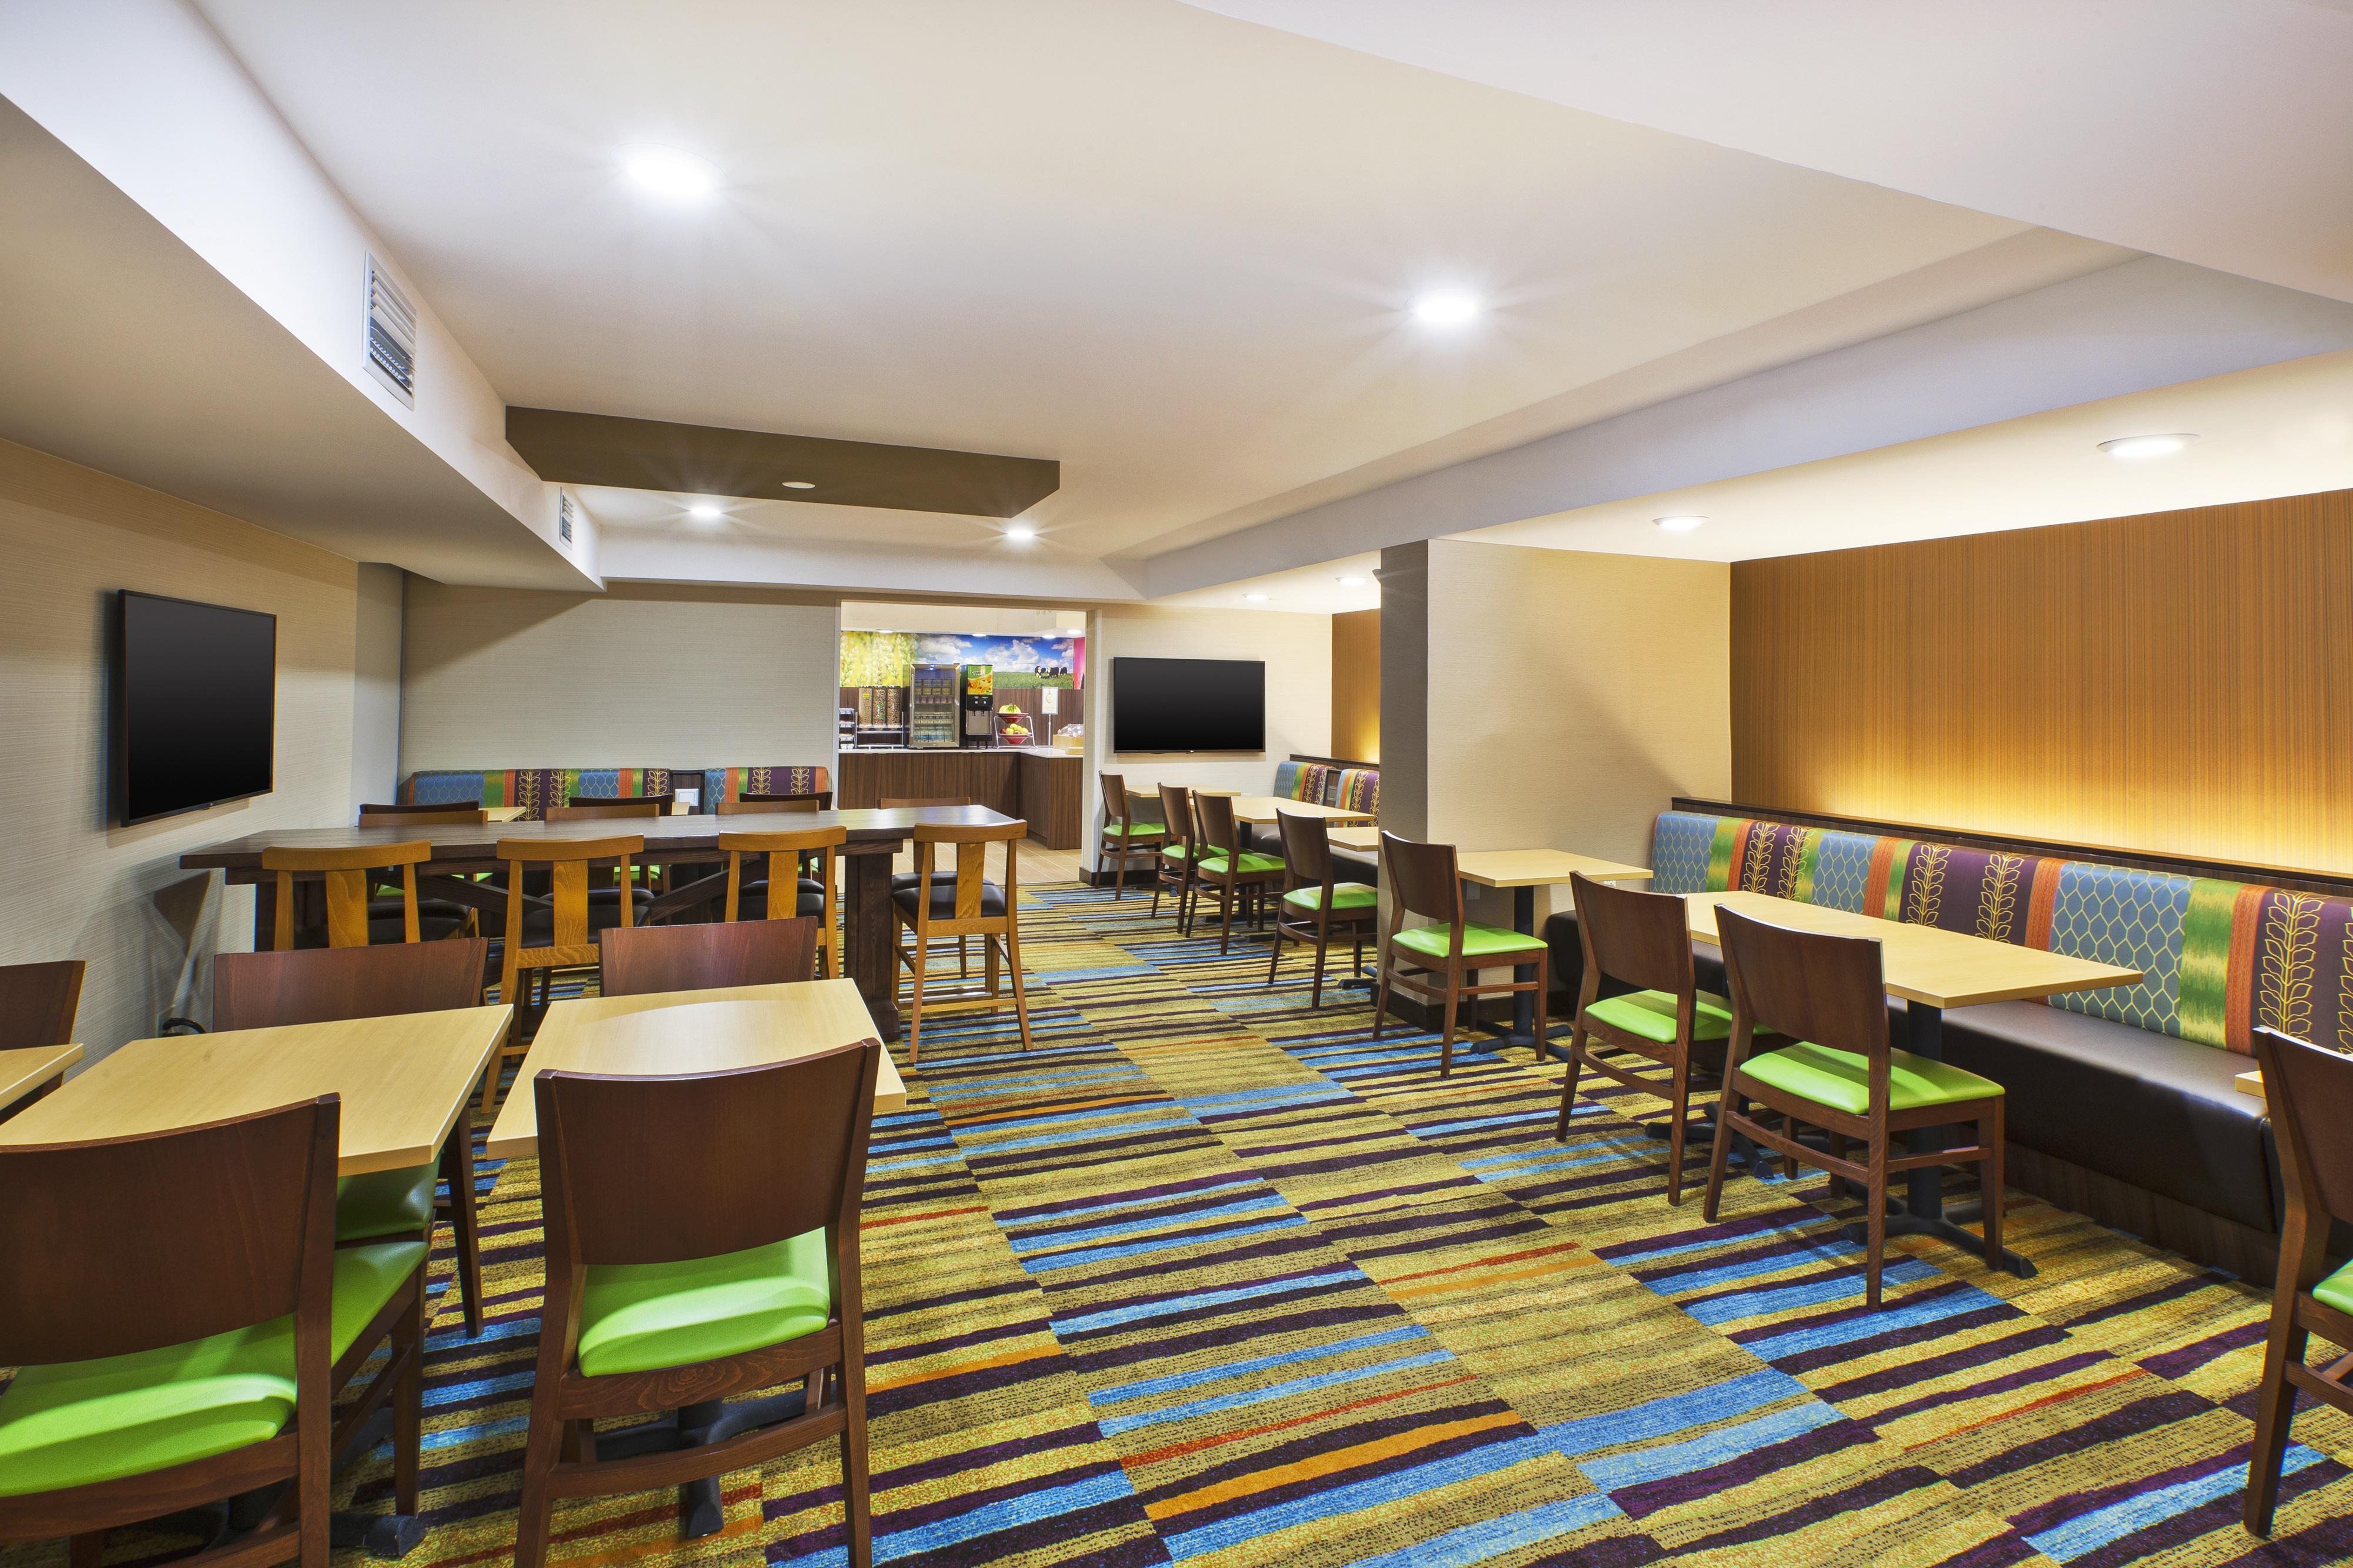 Fairfield Inn & Suites by Marriott Dulles Airport Herndon/Reston image 4